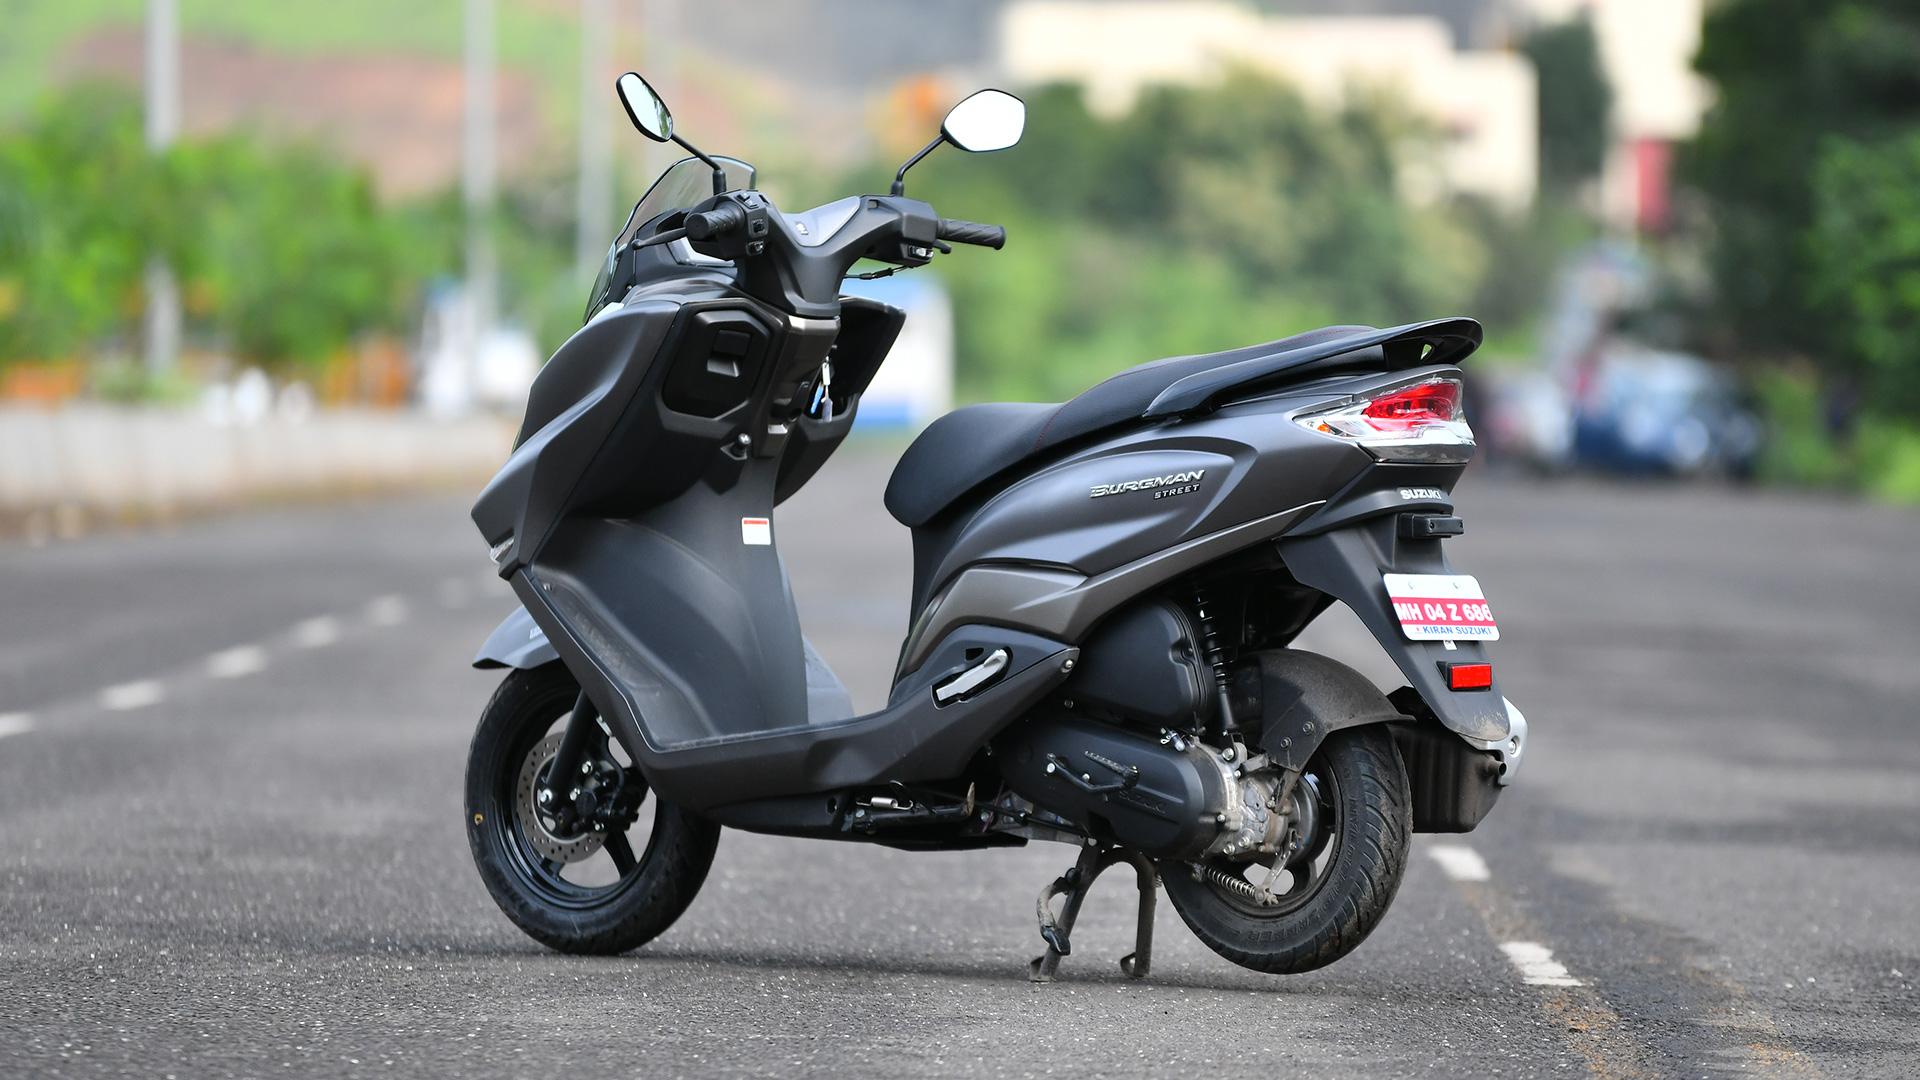 Suzuki Burgman 2020 Street 125 - Price, Mileage, Reviews, Specification,  Gallery - Overdrive